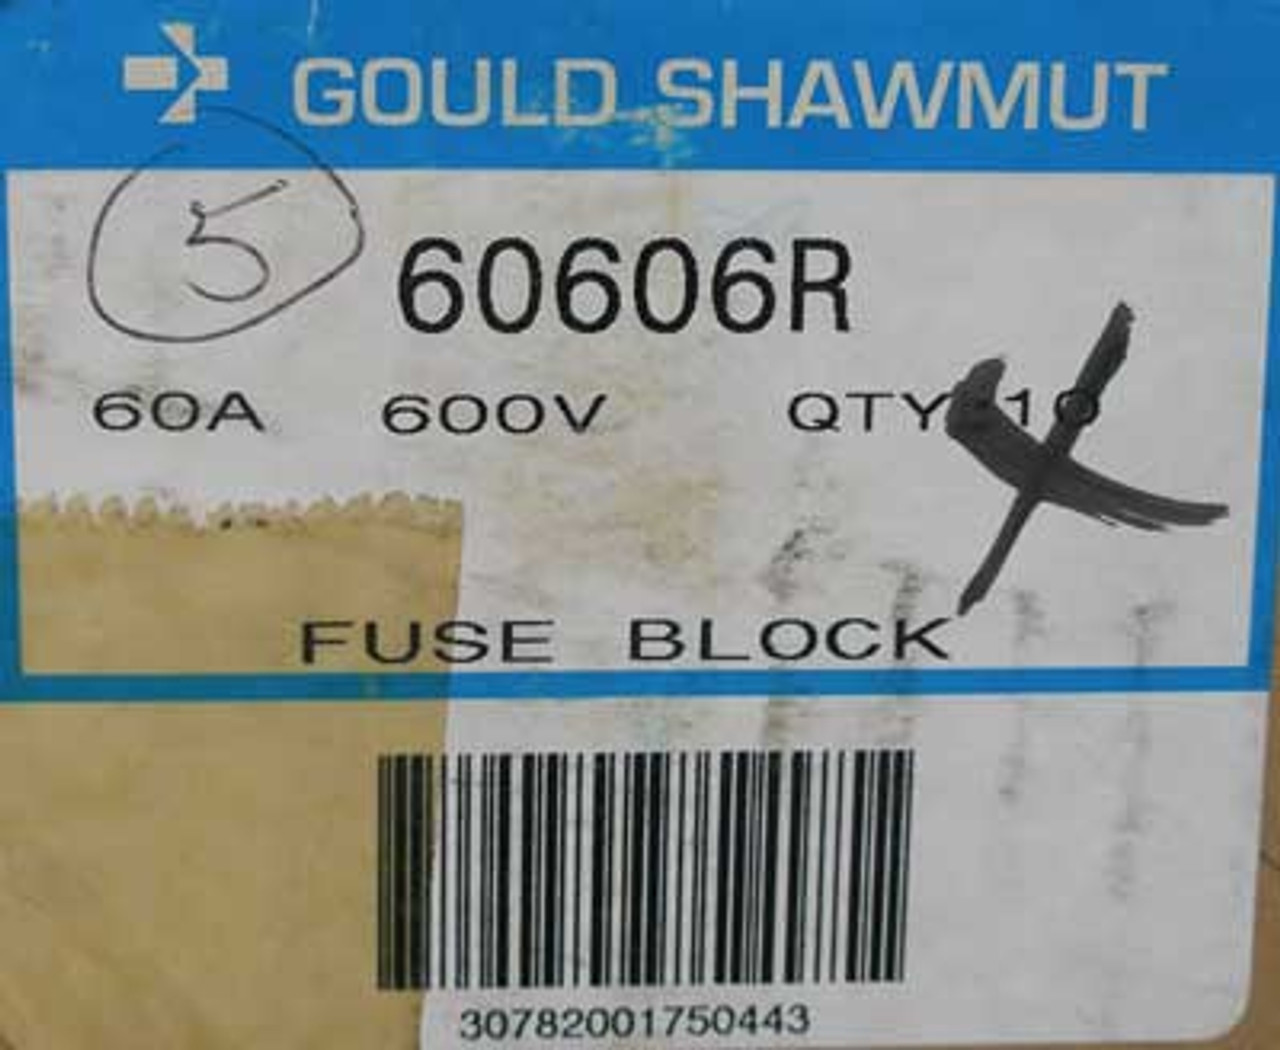 Gould Shawmut 60606R 1 Pole 60 Amp 600VAC Fuse Block (Lot of 5) - New